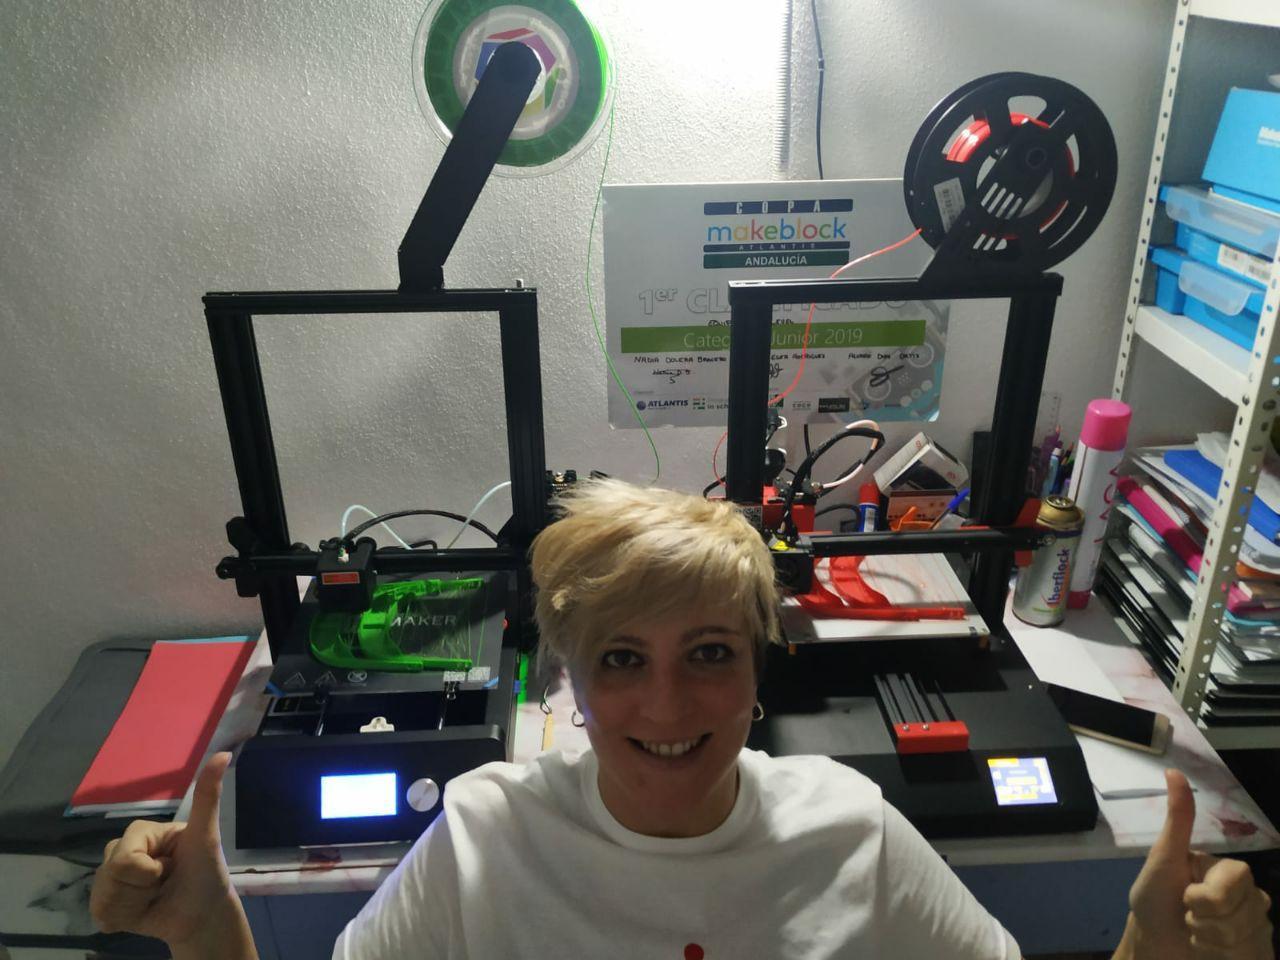 Bastetana fabricando pantallas de protección en su impresora 3D